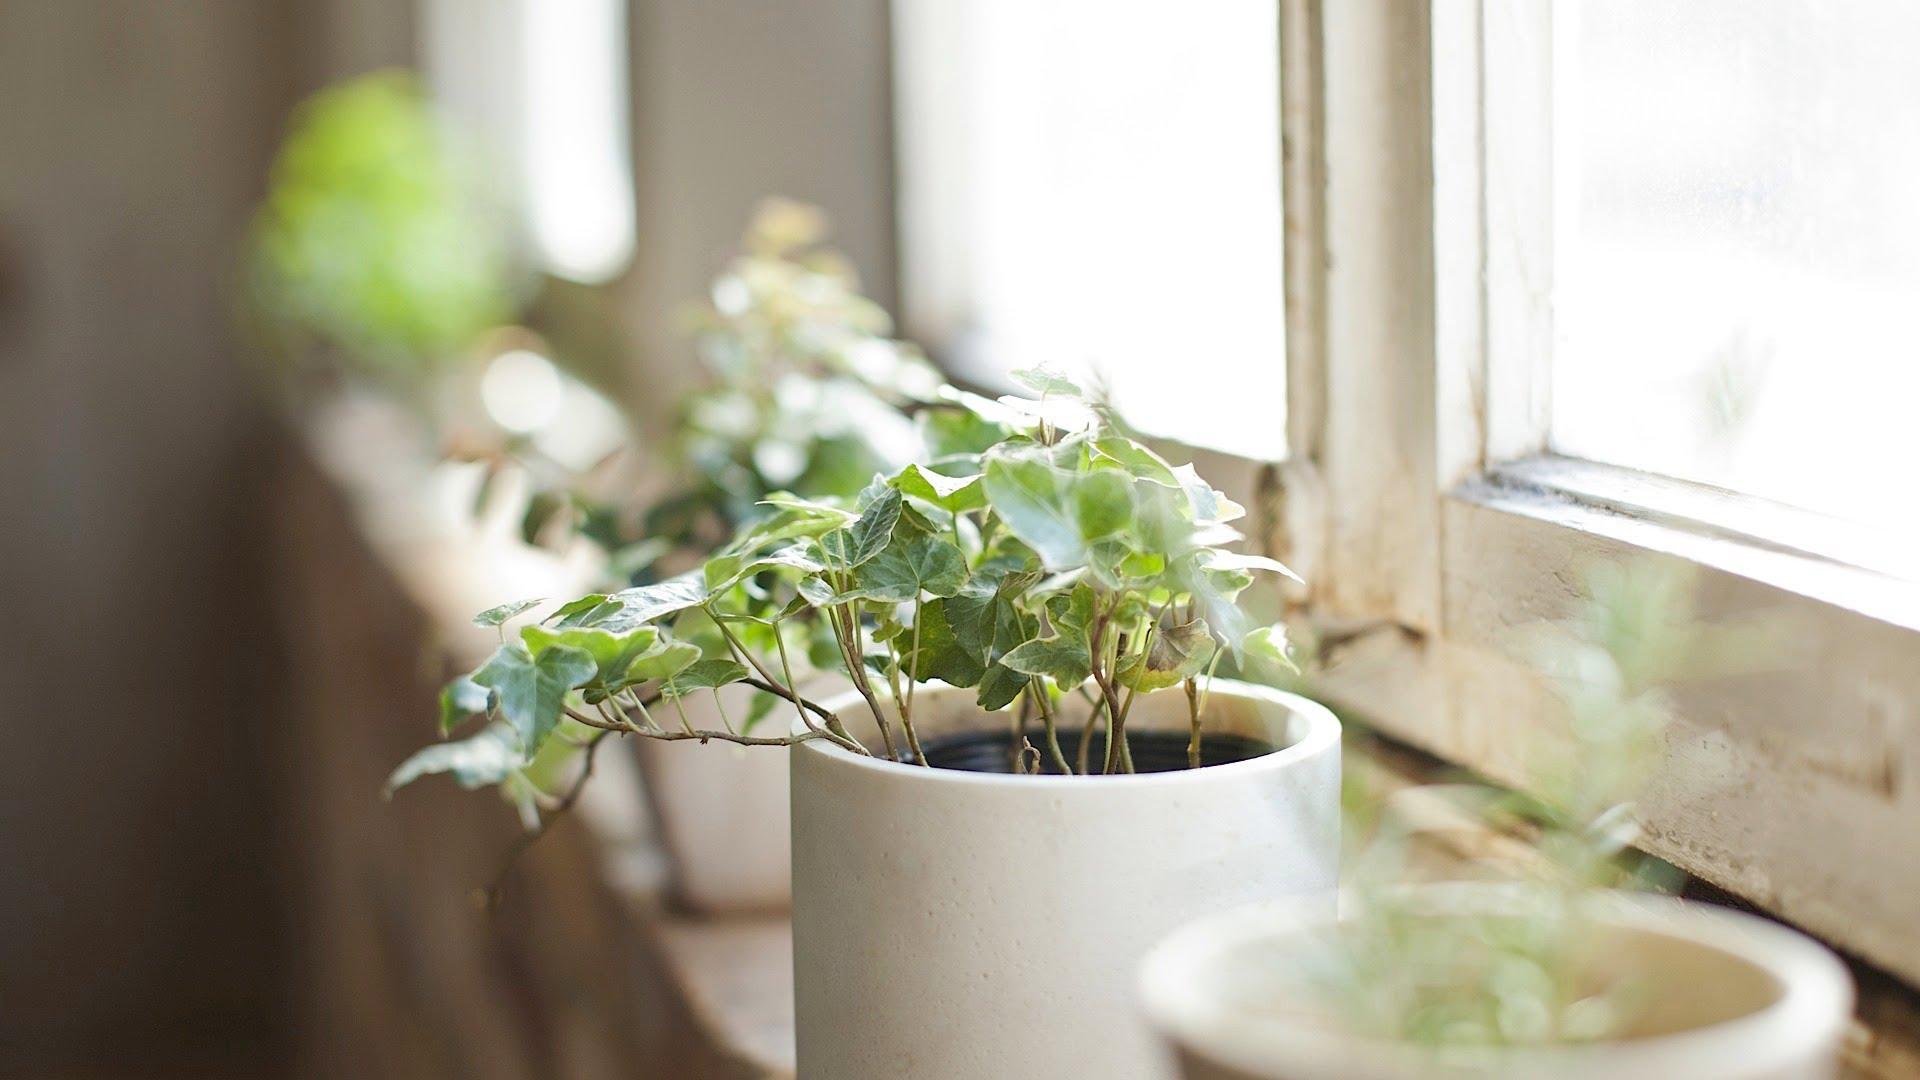 Домашние растения по фен шуй